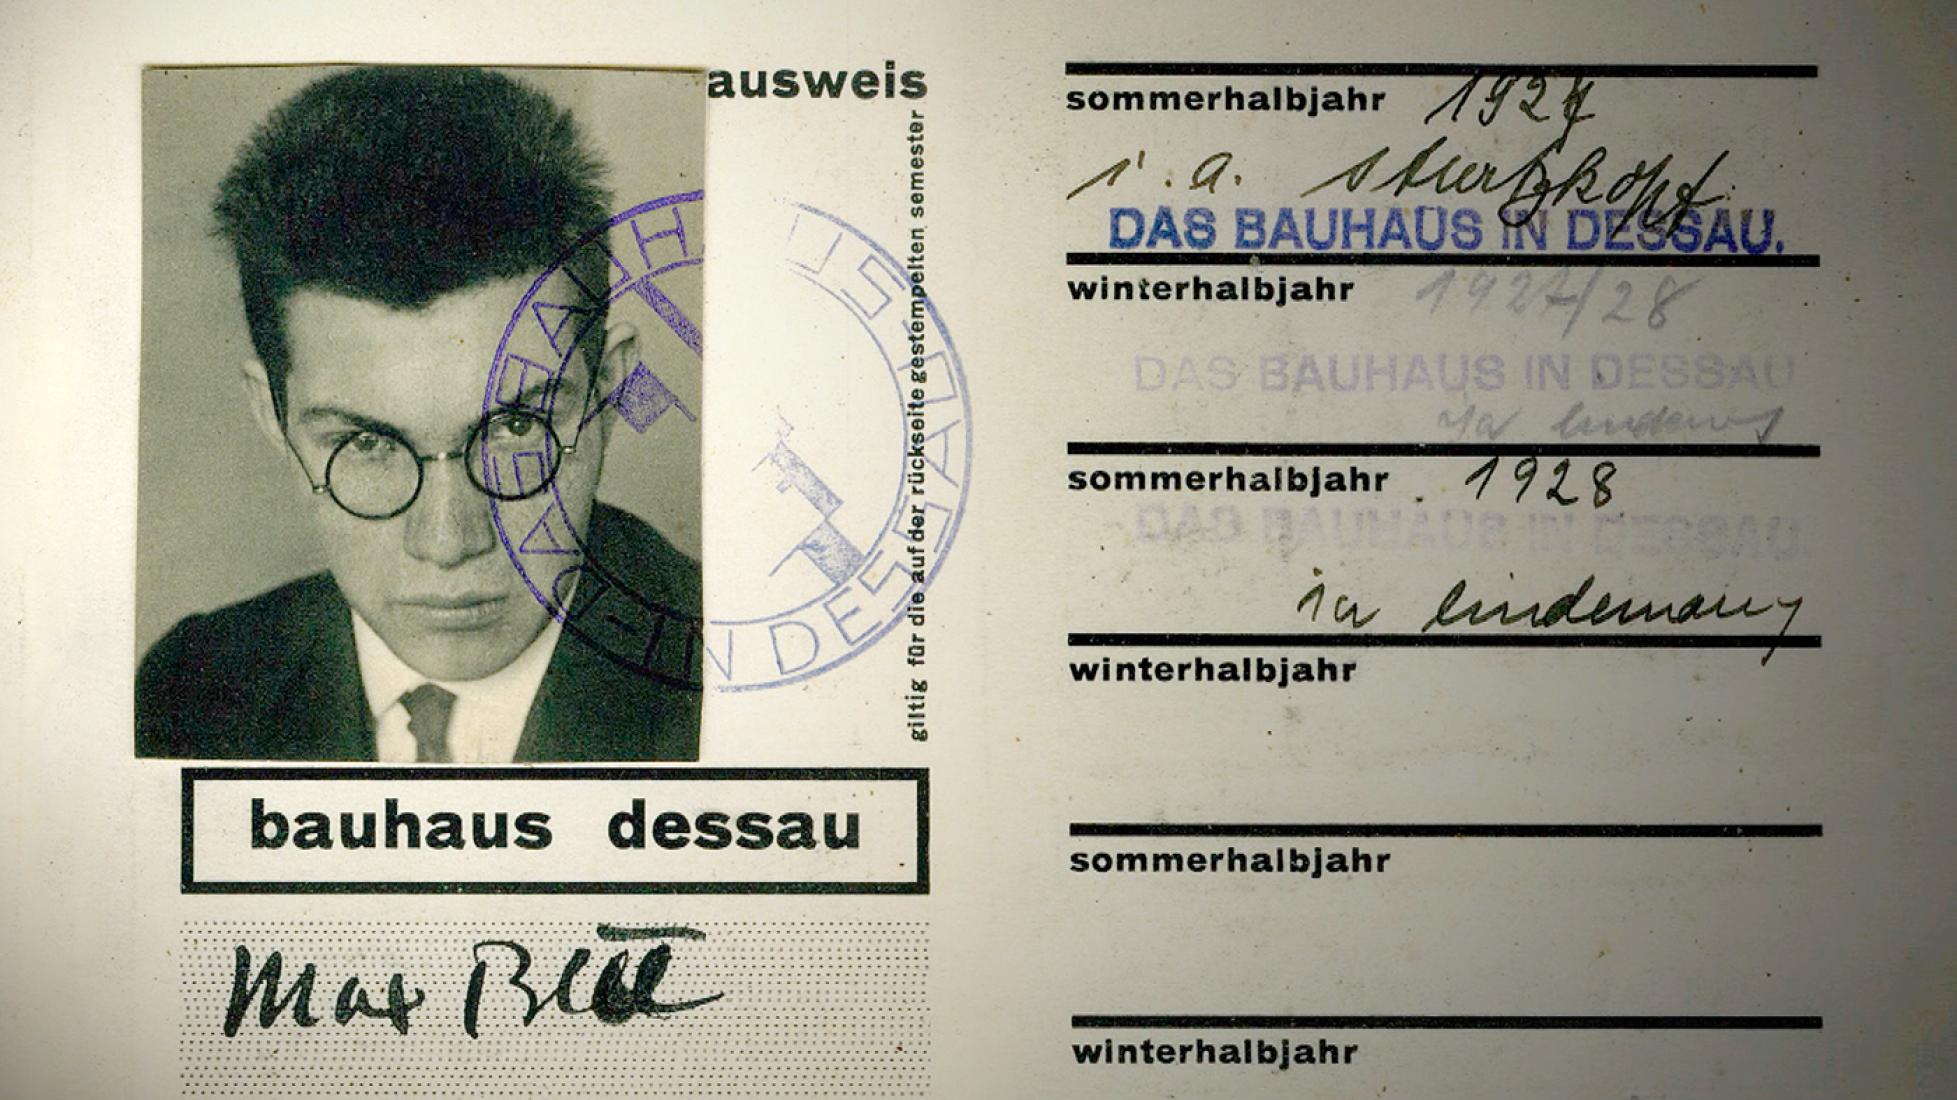 Carnet de estudiante de la Bauhaus 1927-1928. Imagen de la película documental